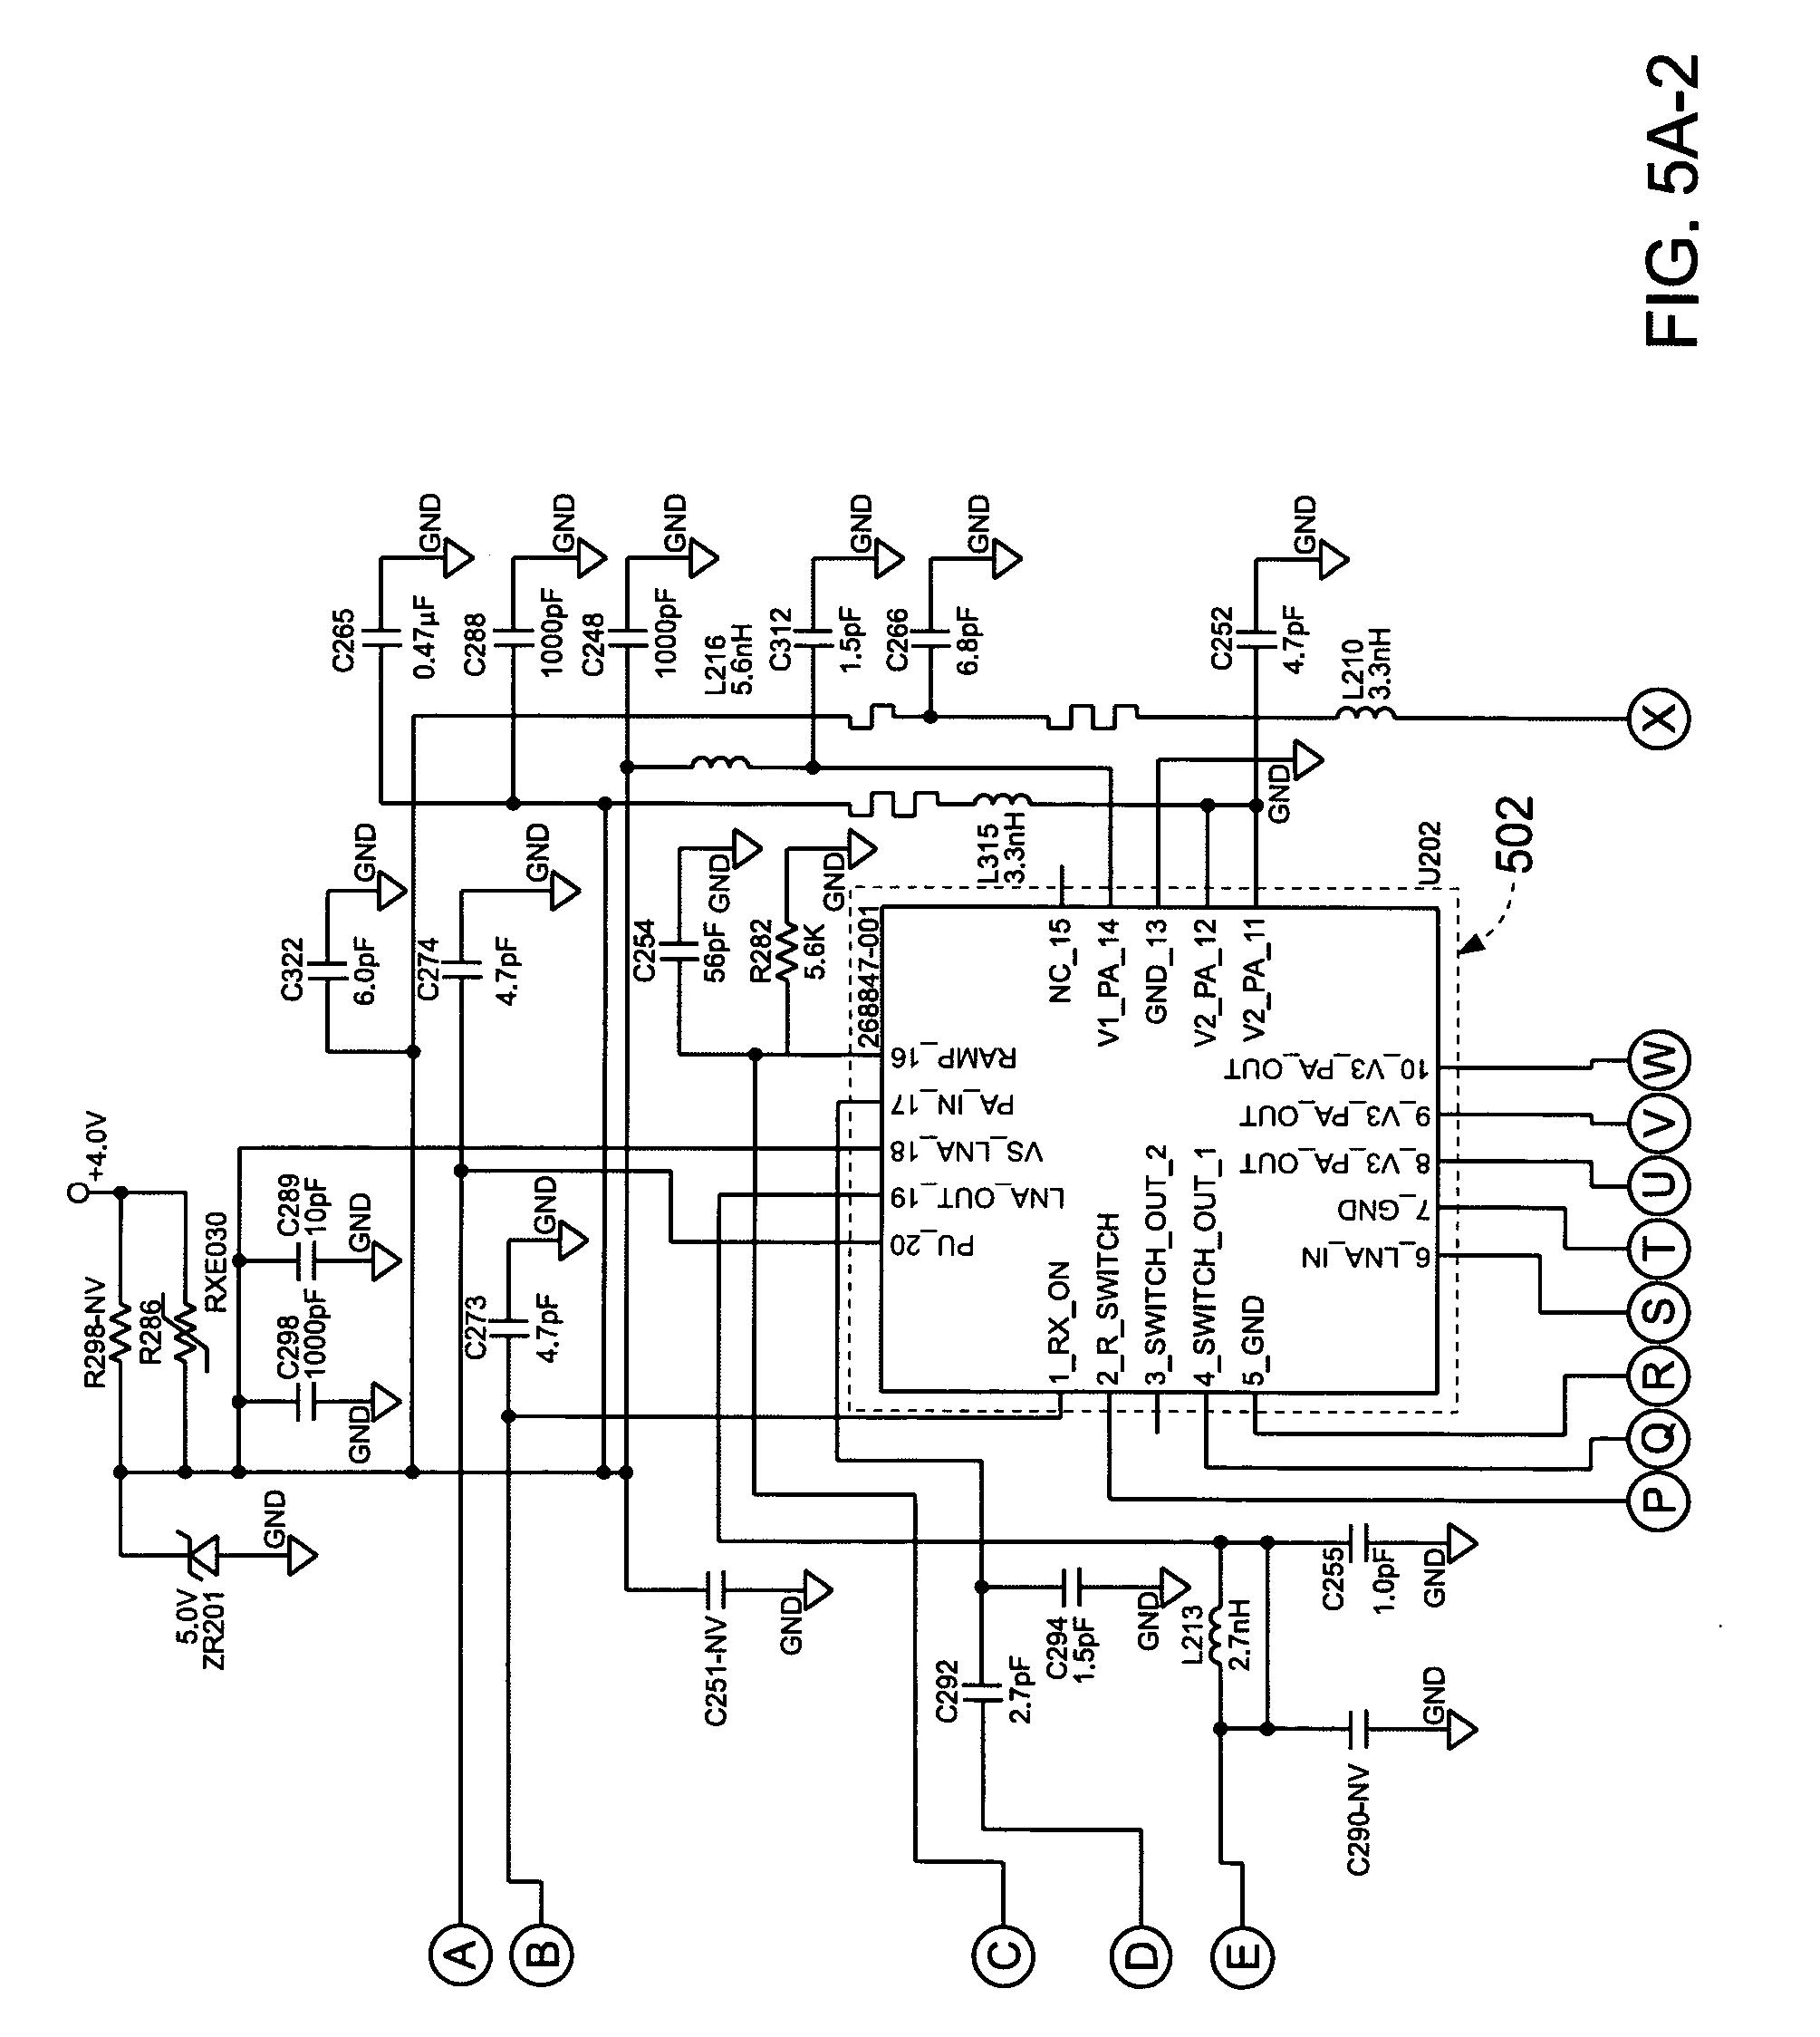 Bose Ps28 Wiring Diagram from diagramweb.net